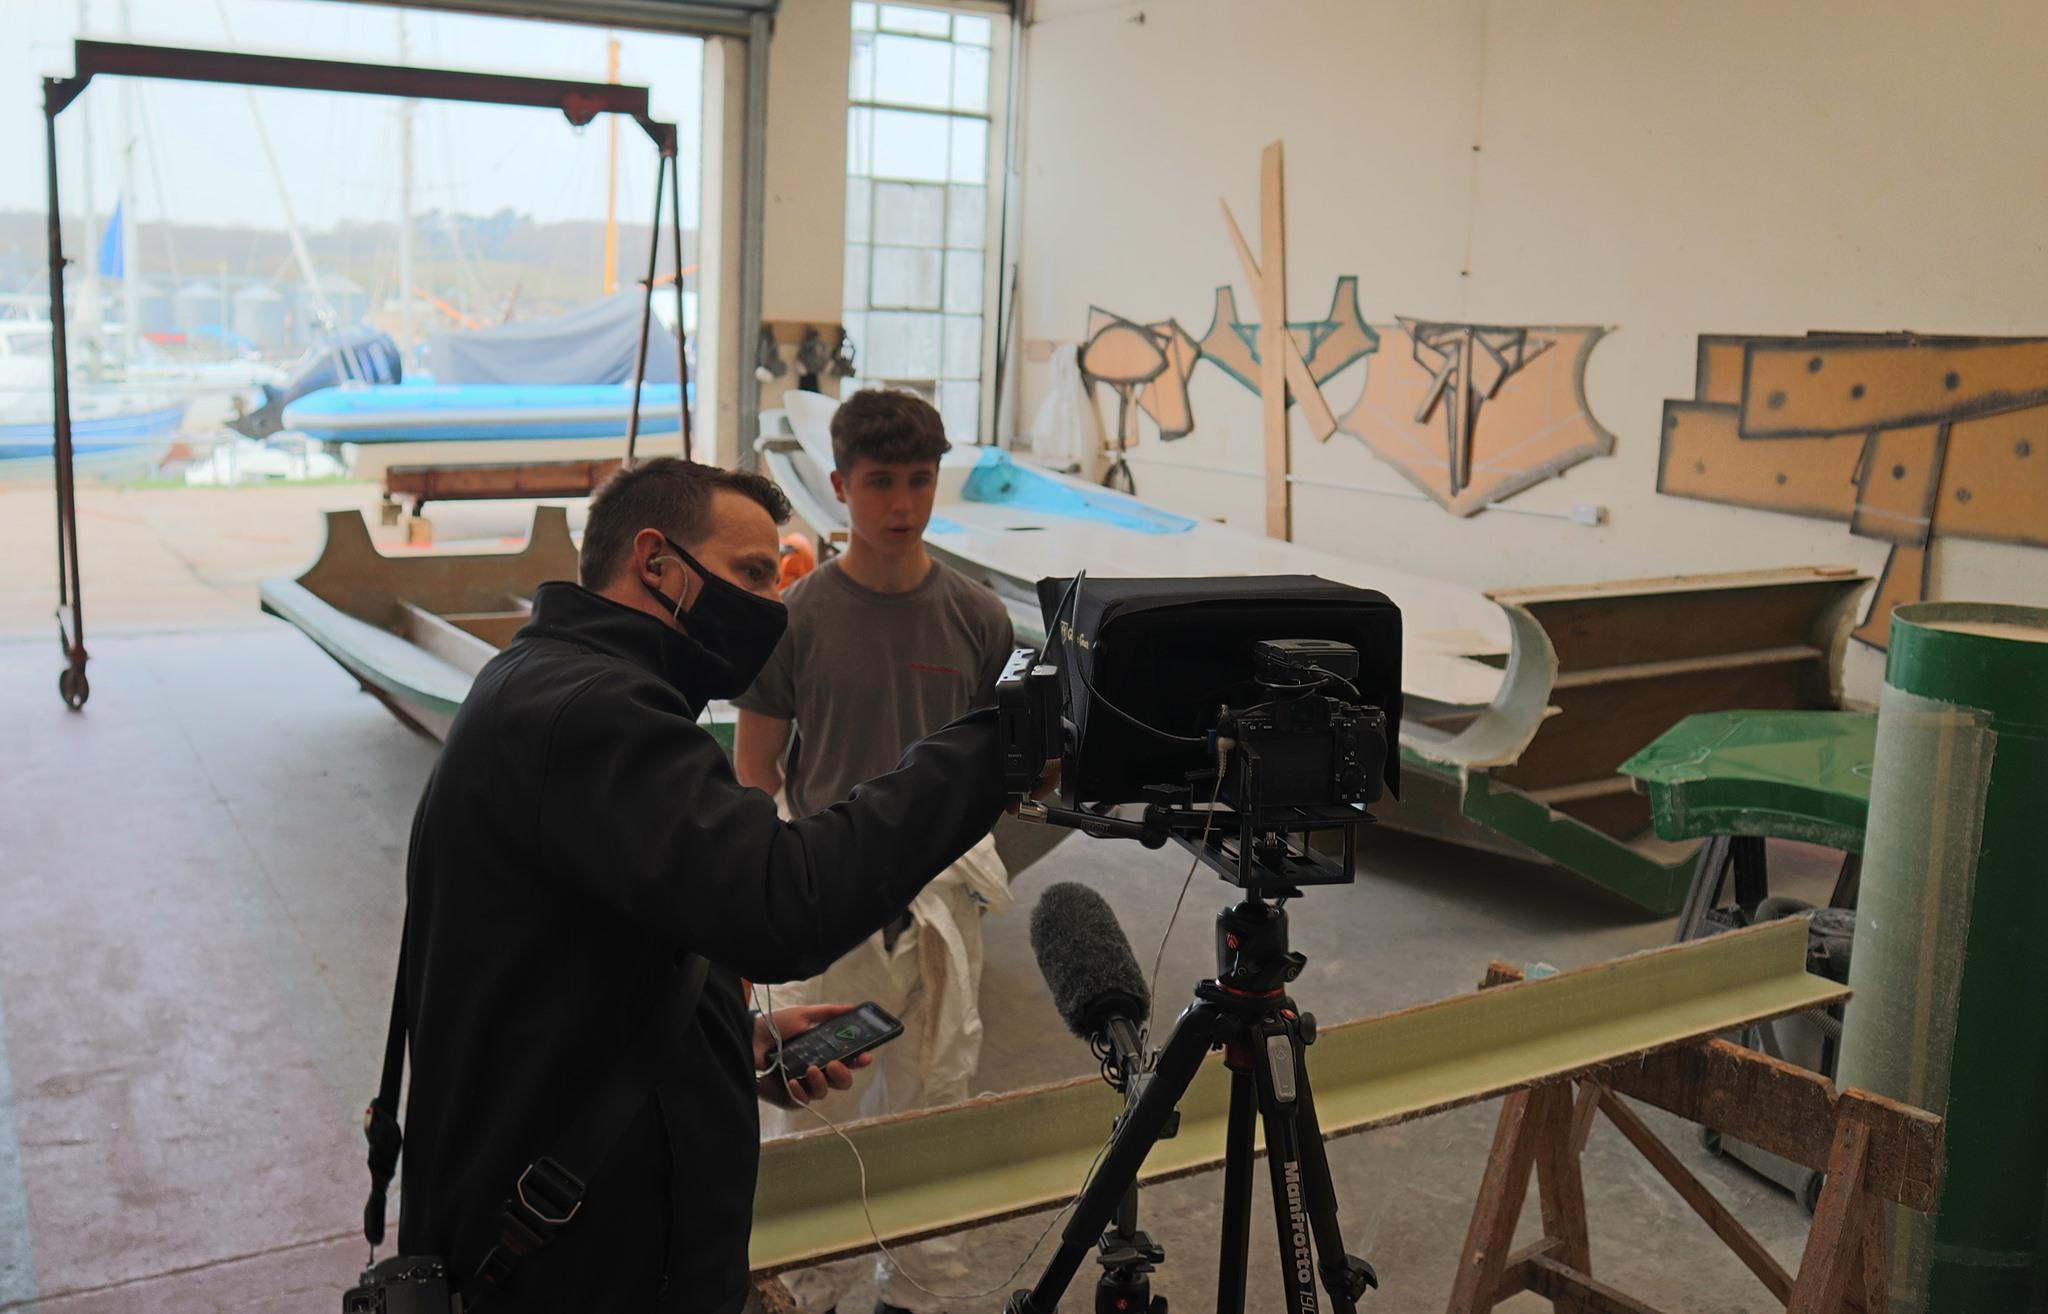 Tom interviewed for Ormiston Academies Trust